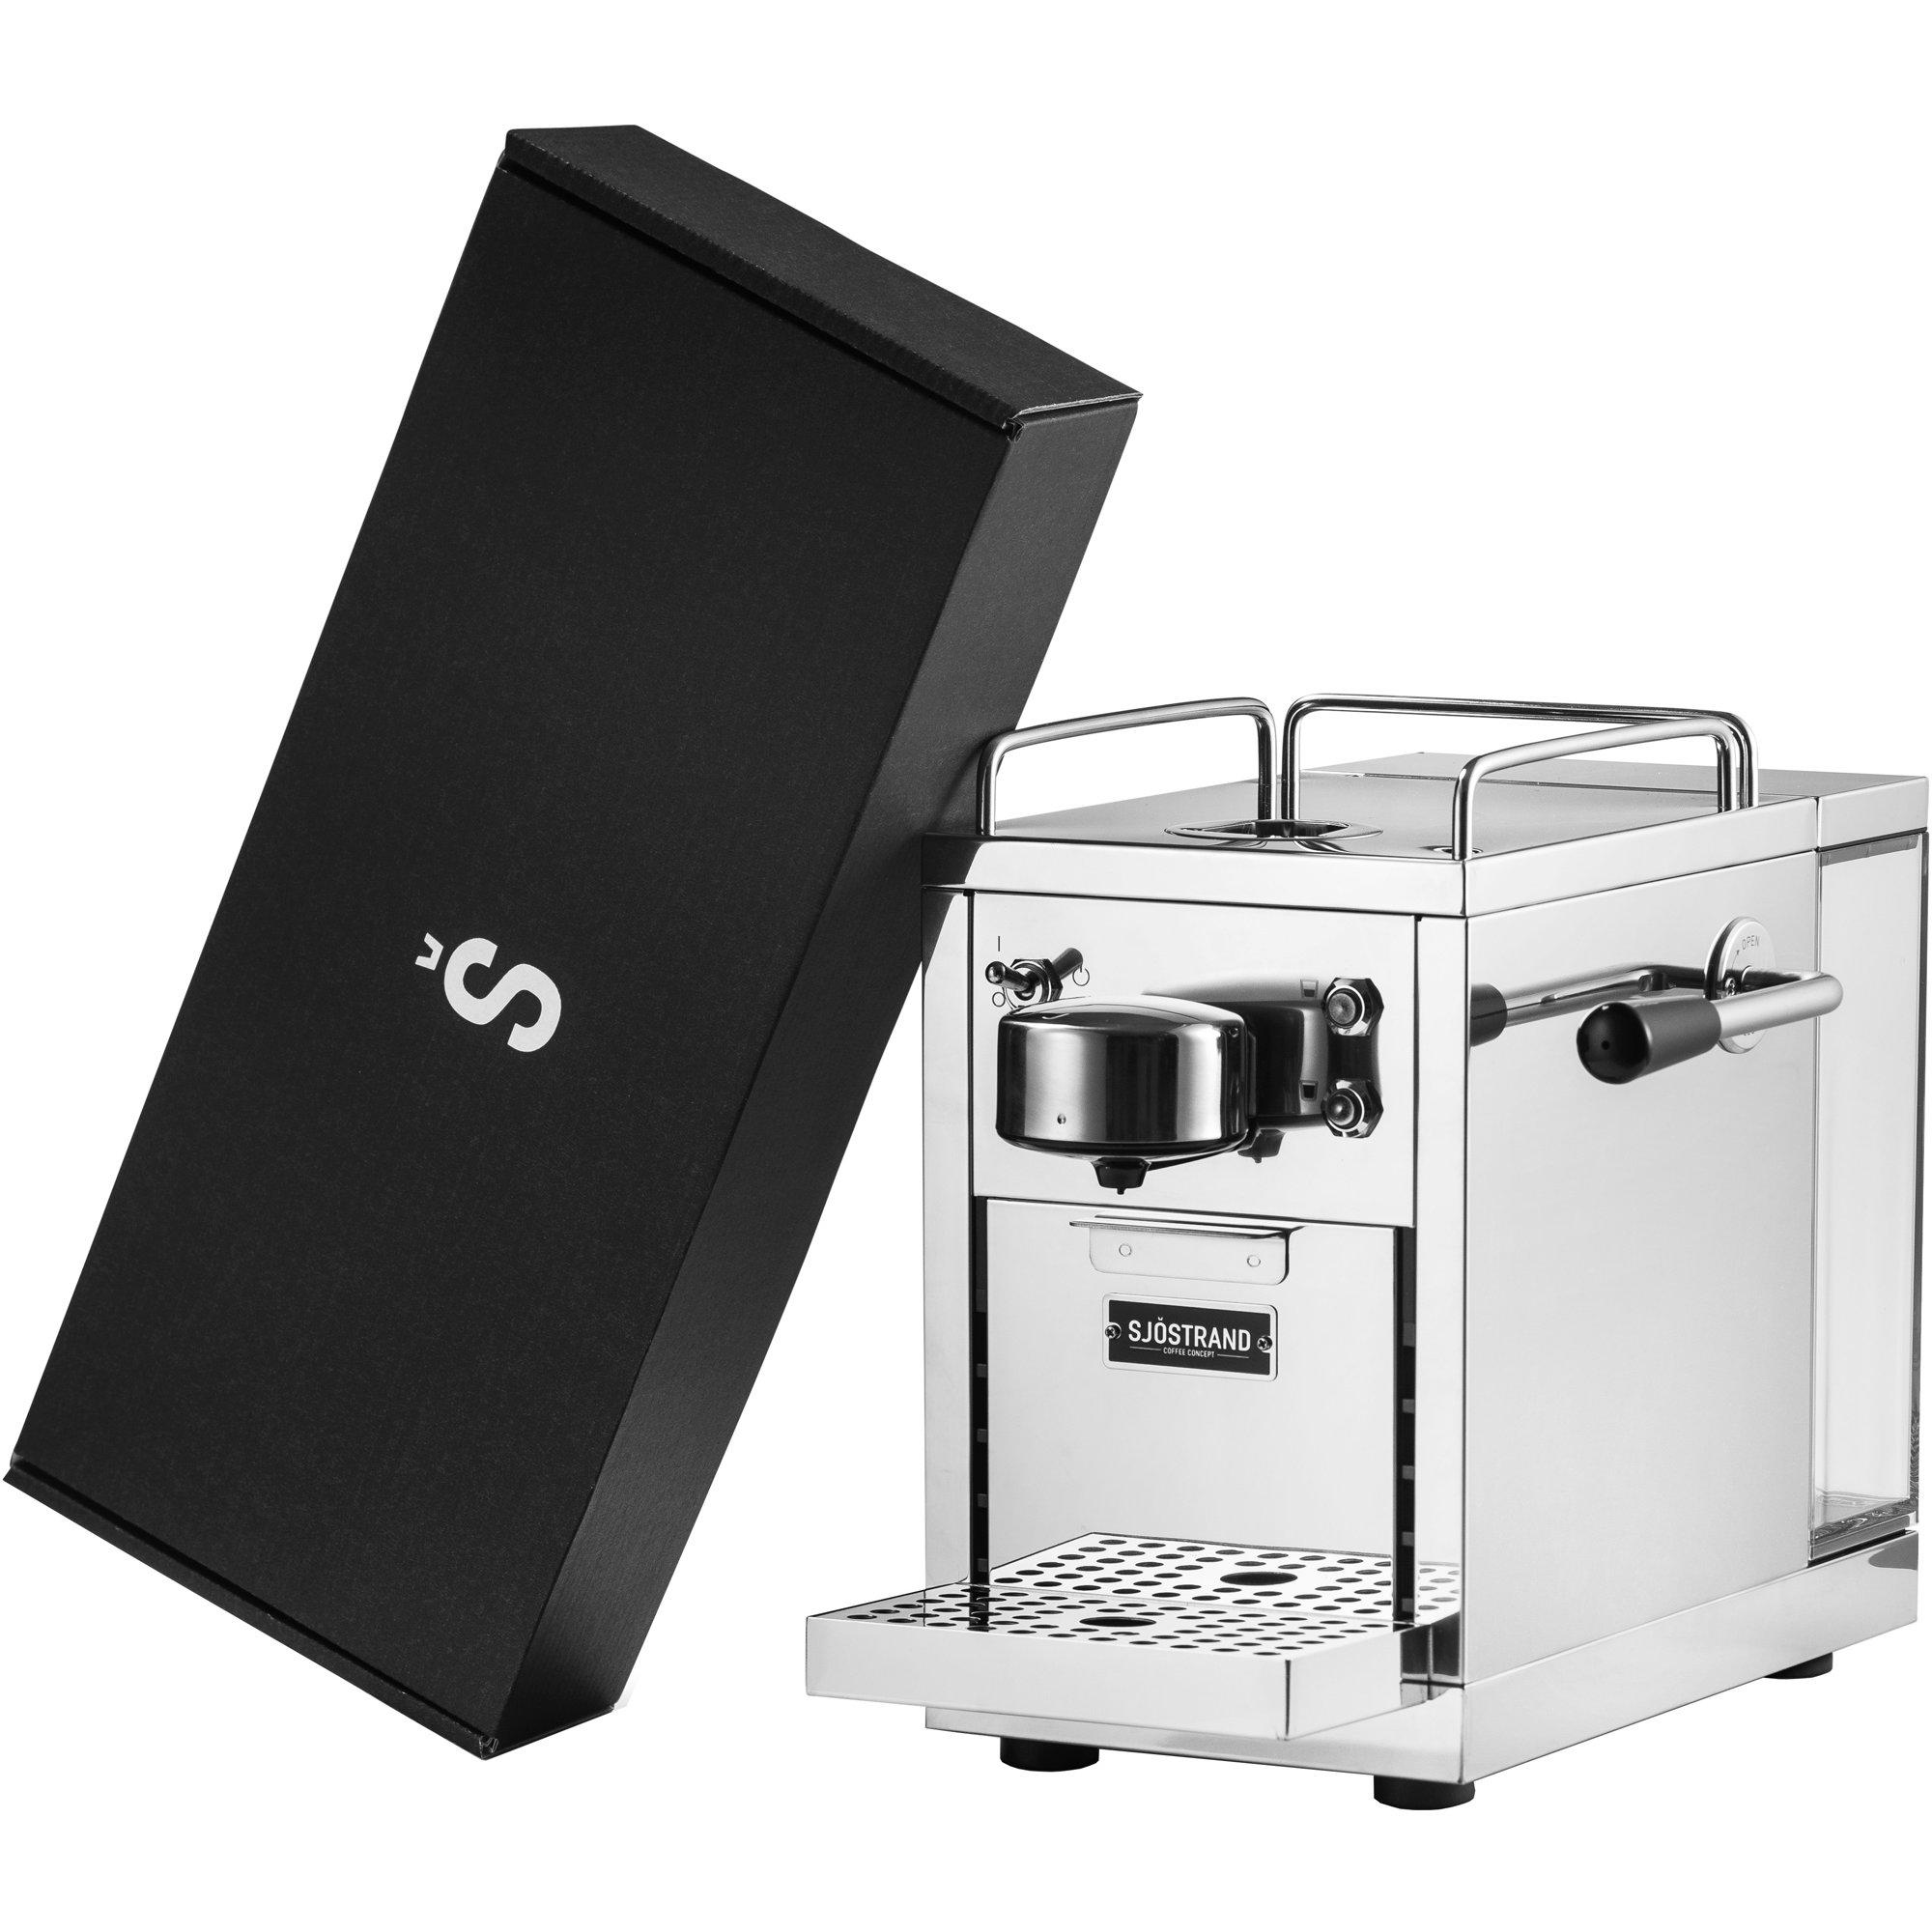 Sjöstrand Espresso kapselmaskin med 100 kaffekapslar